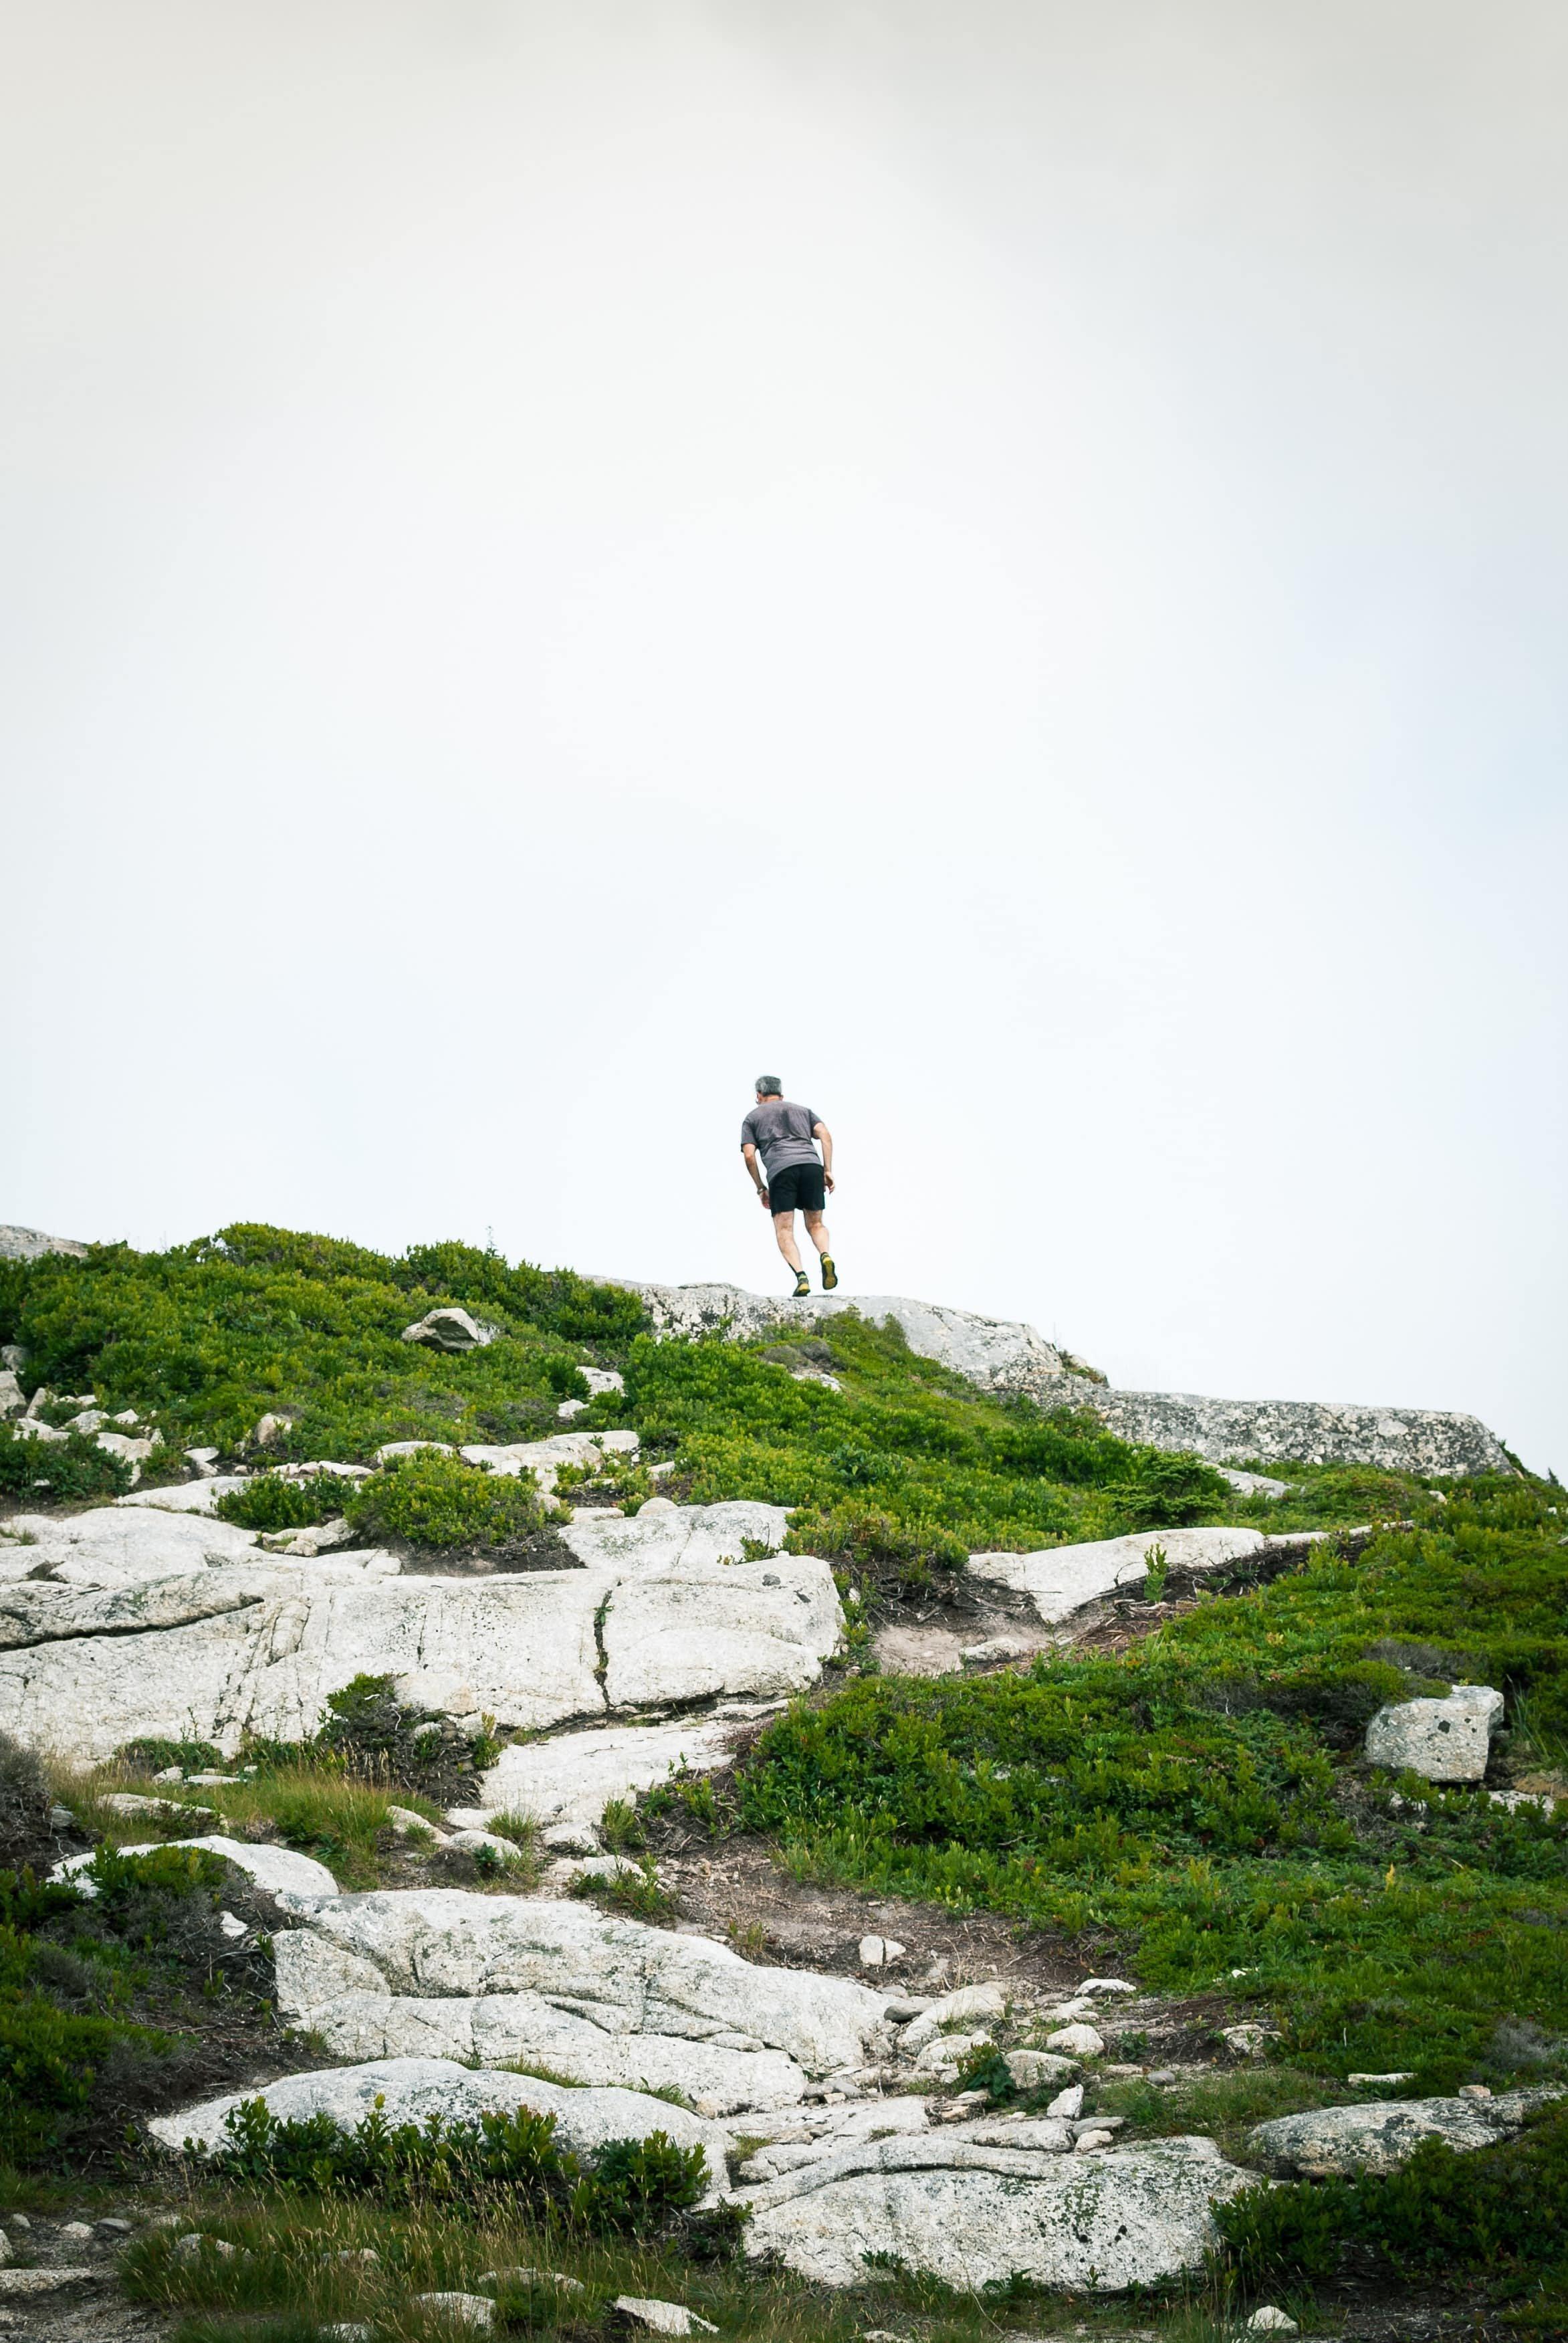 Bien s'entraîner en trail course